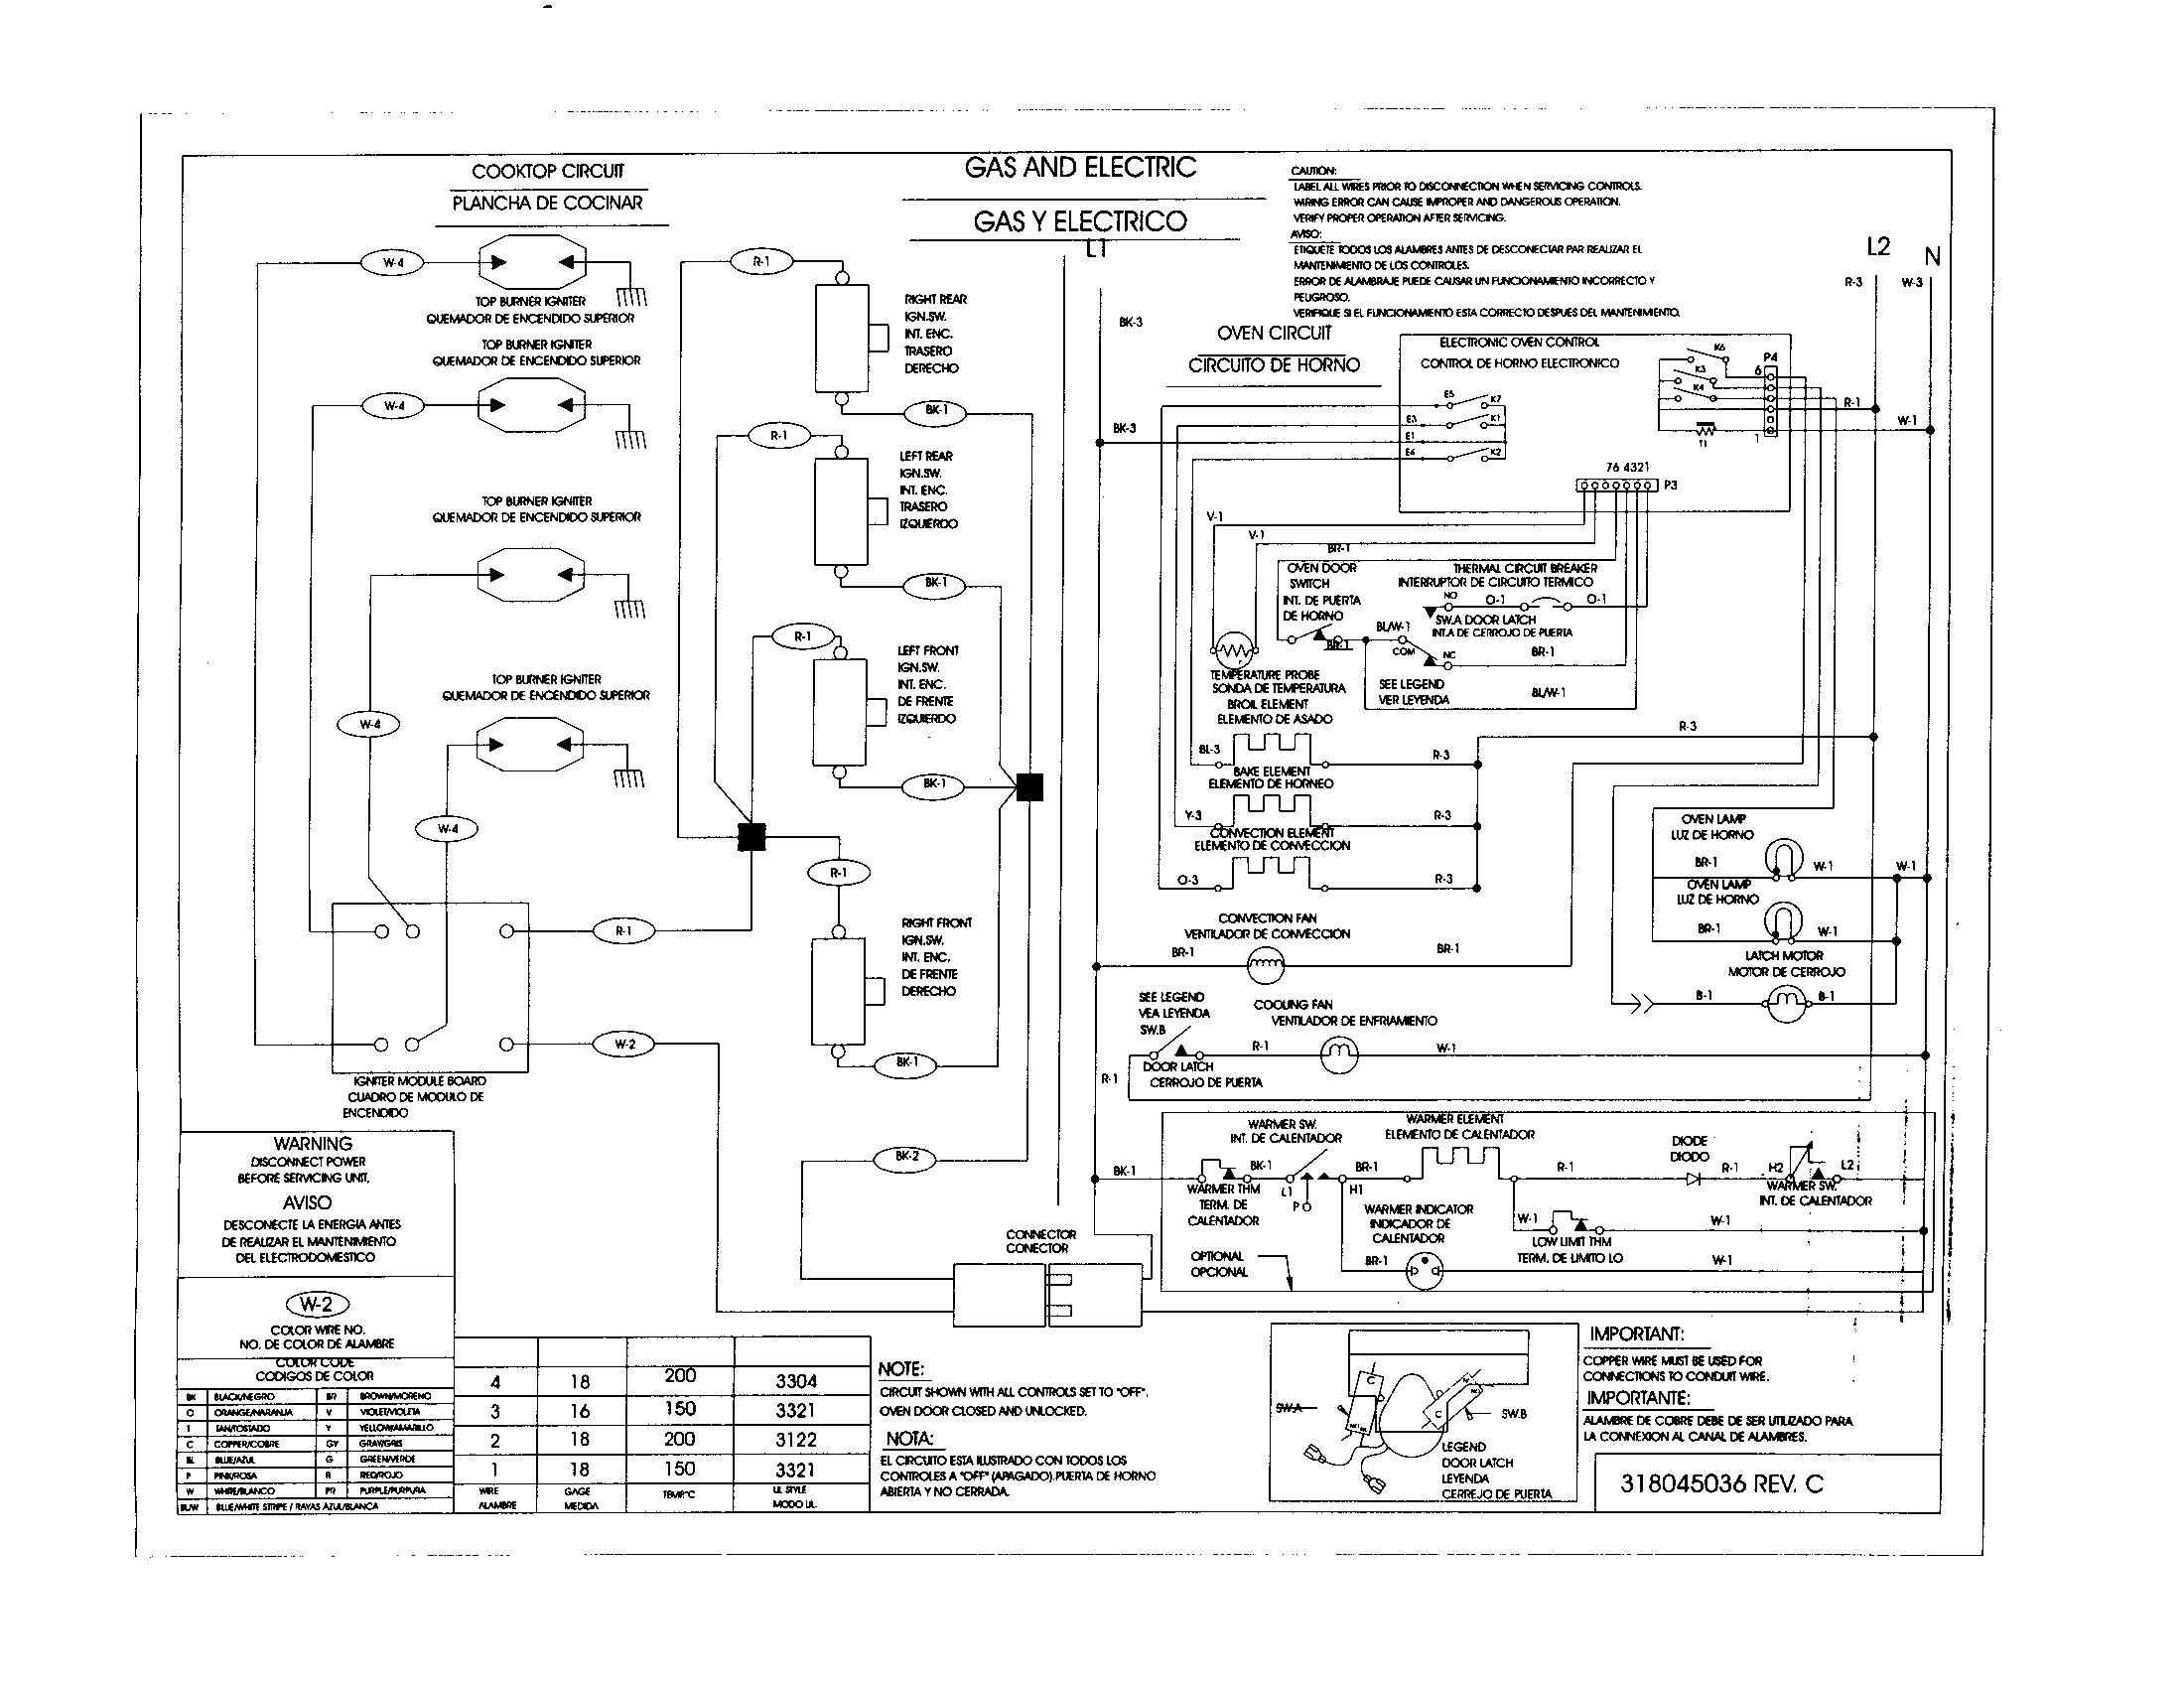 Miraculous Whirlpool Dishwasher Electrical Diagram Wiring Diagram Wiring Database Numdin4X4Andersnl